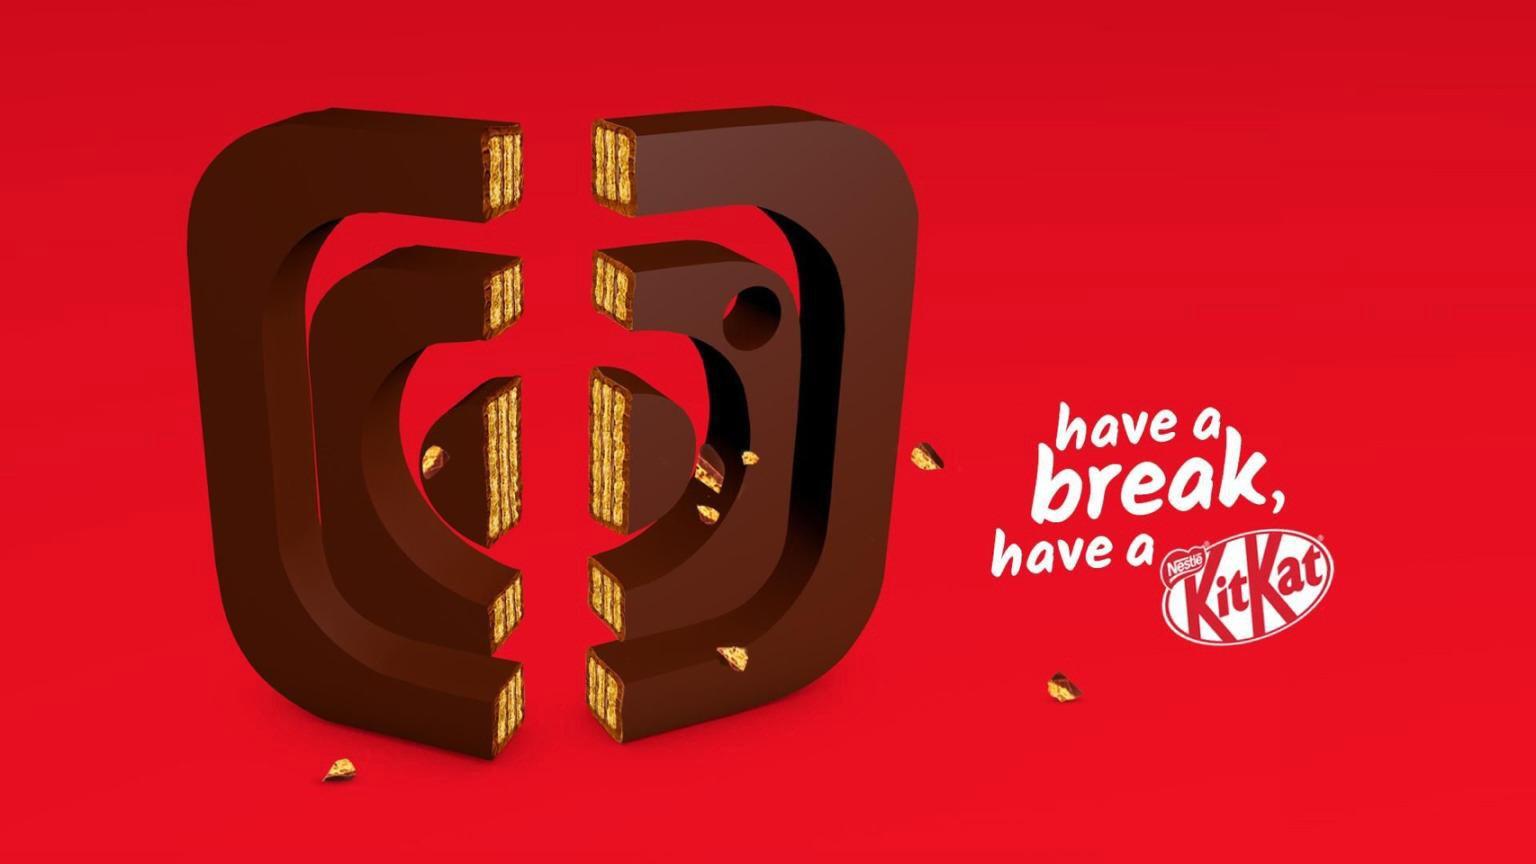 KitKat: Have a break from the social media